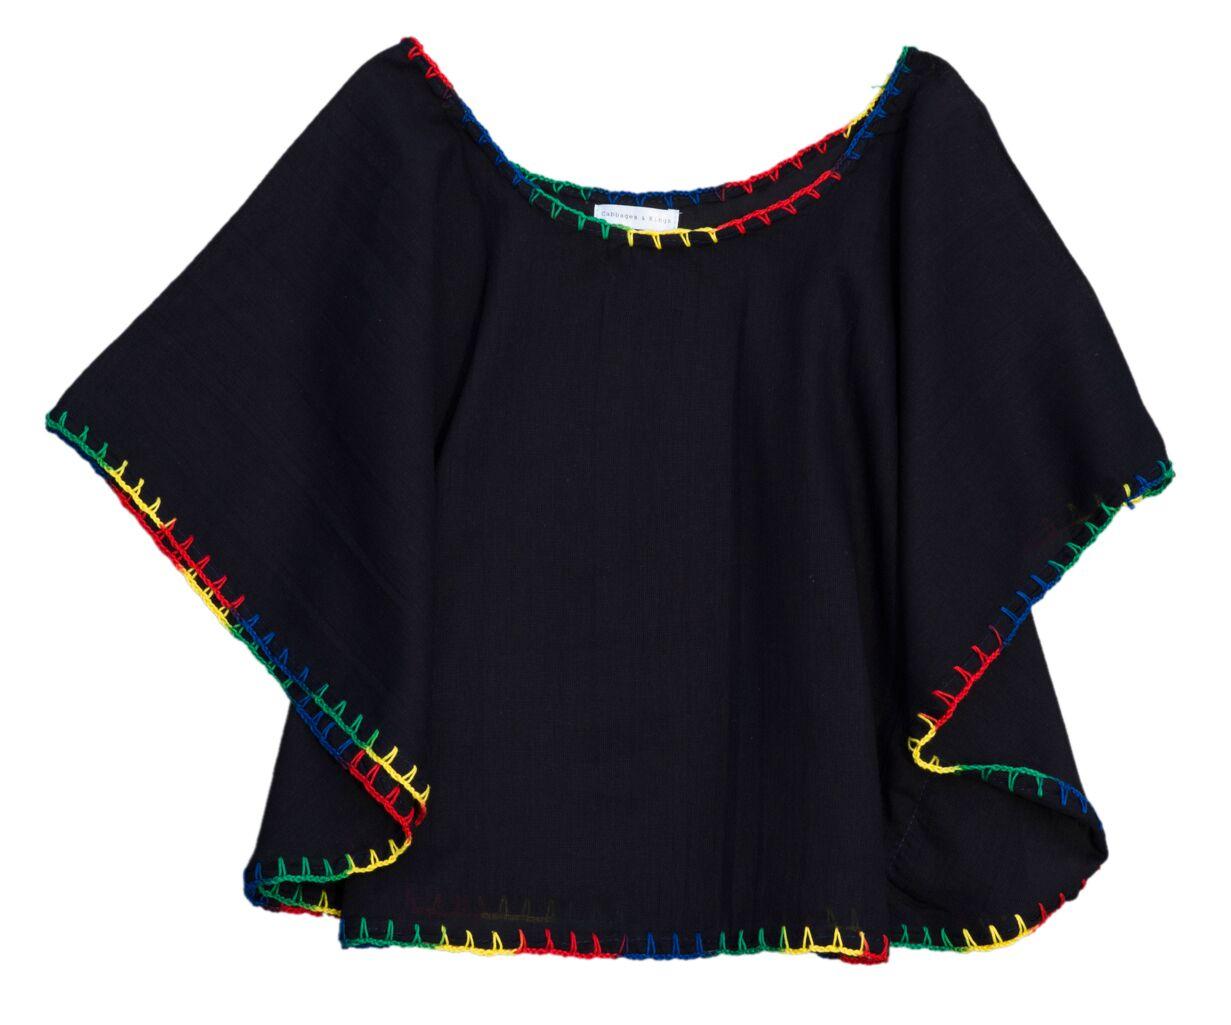 845d13cbaad5 black rainbow hand-stitch blouse cotton kids cabbages & kings ny still.jpg